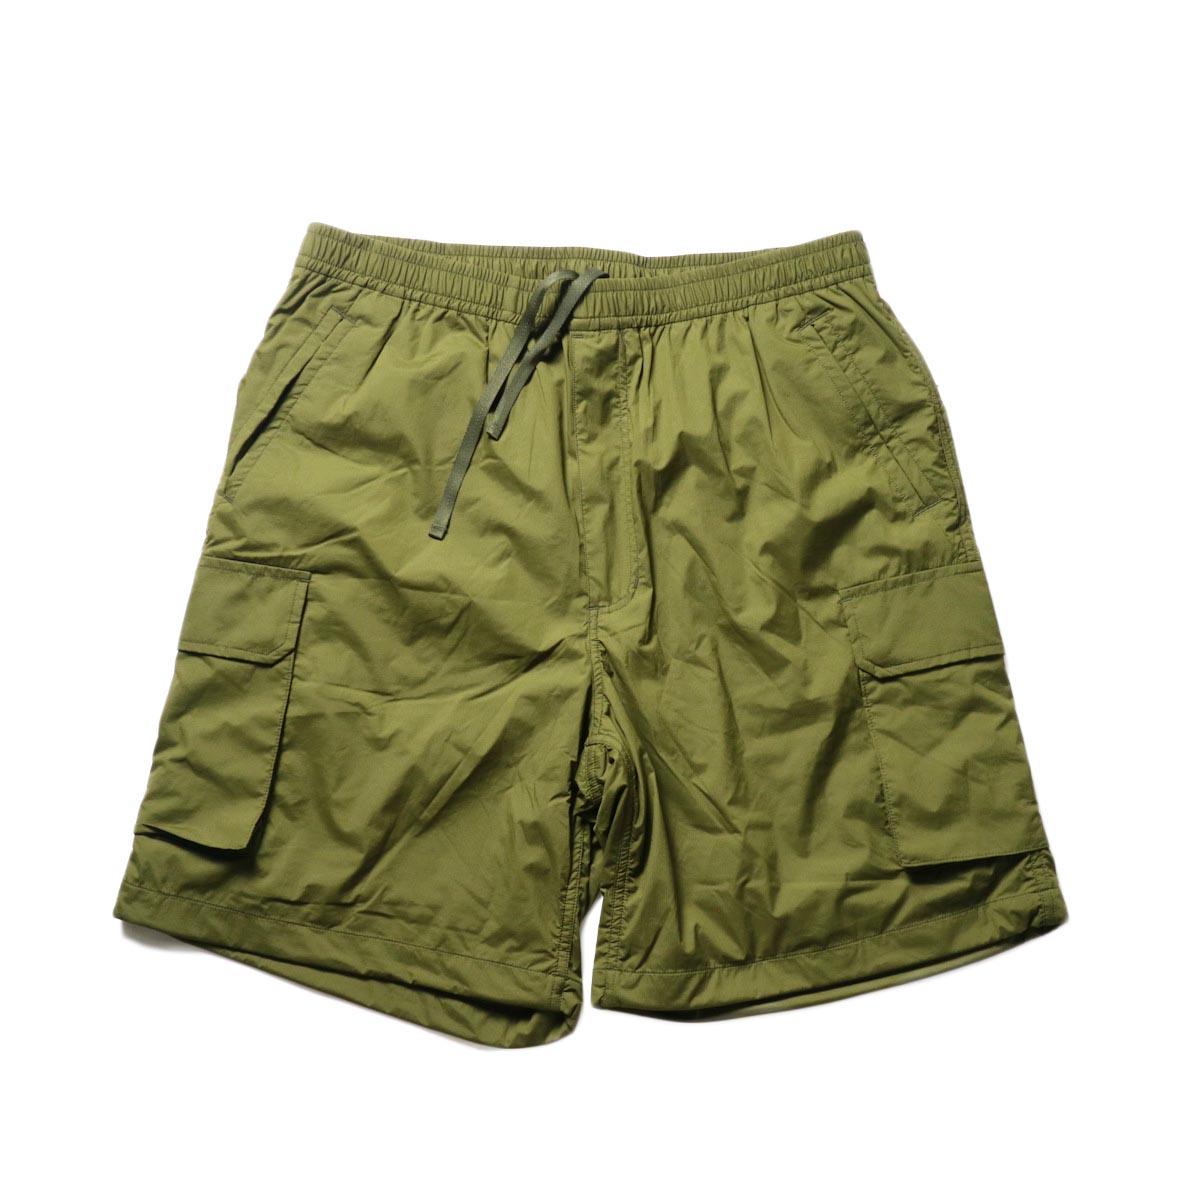 DAIWA PIER39 / Tech French Mil Field Shorts (Olive)